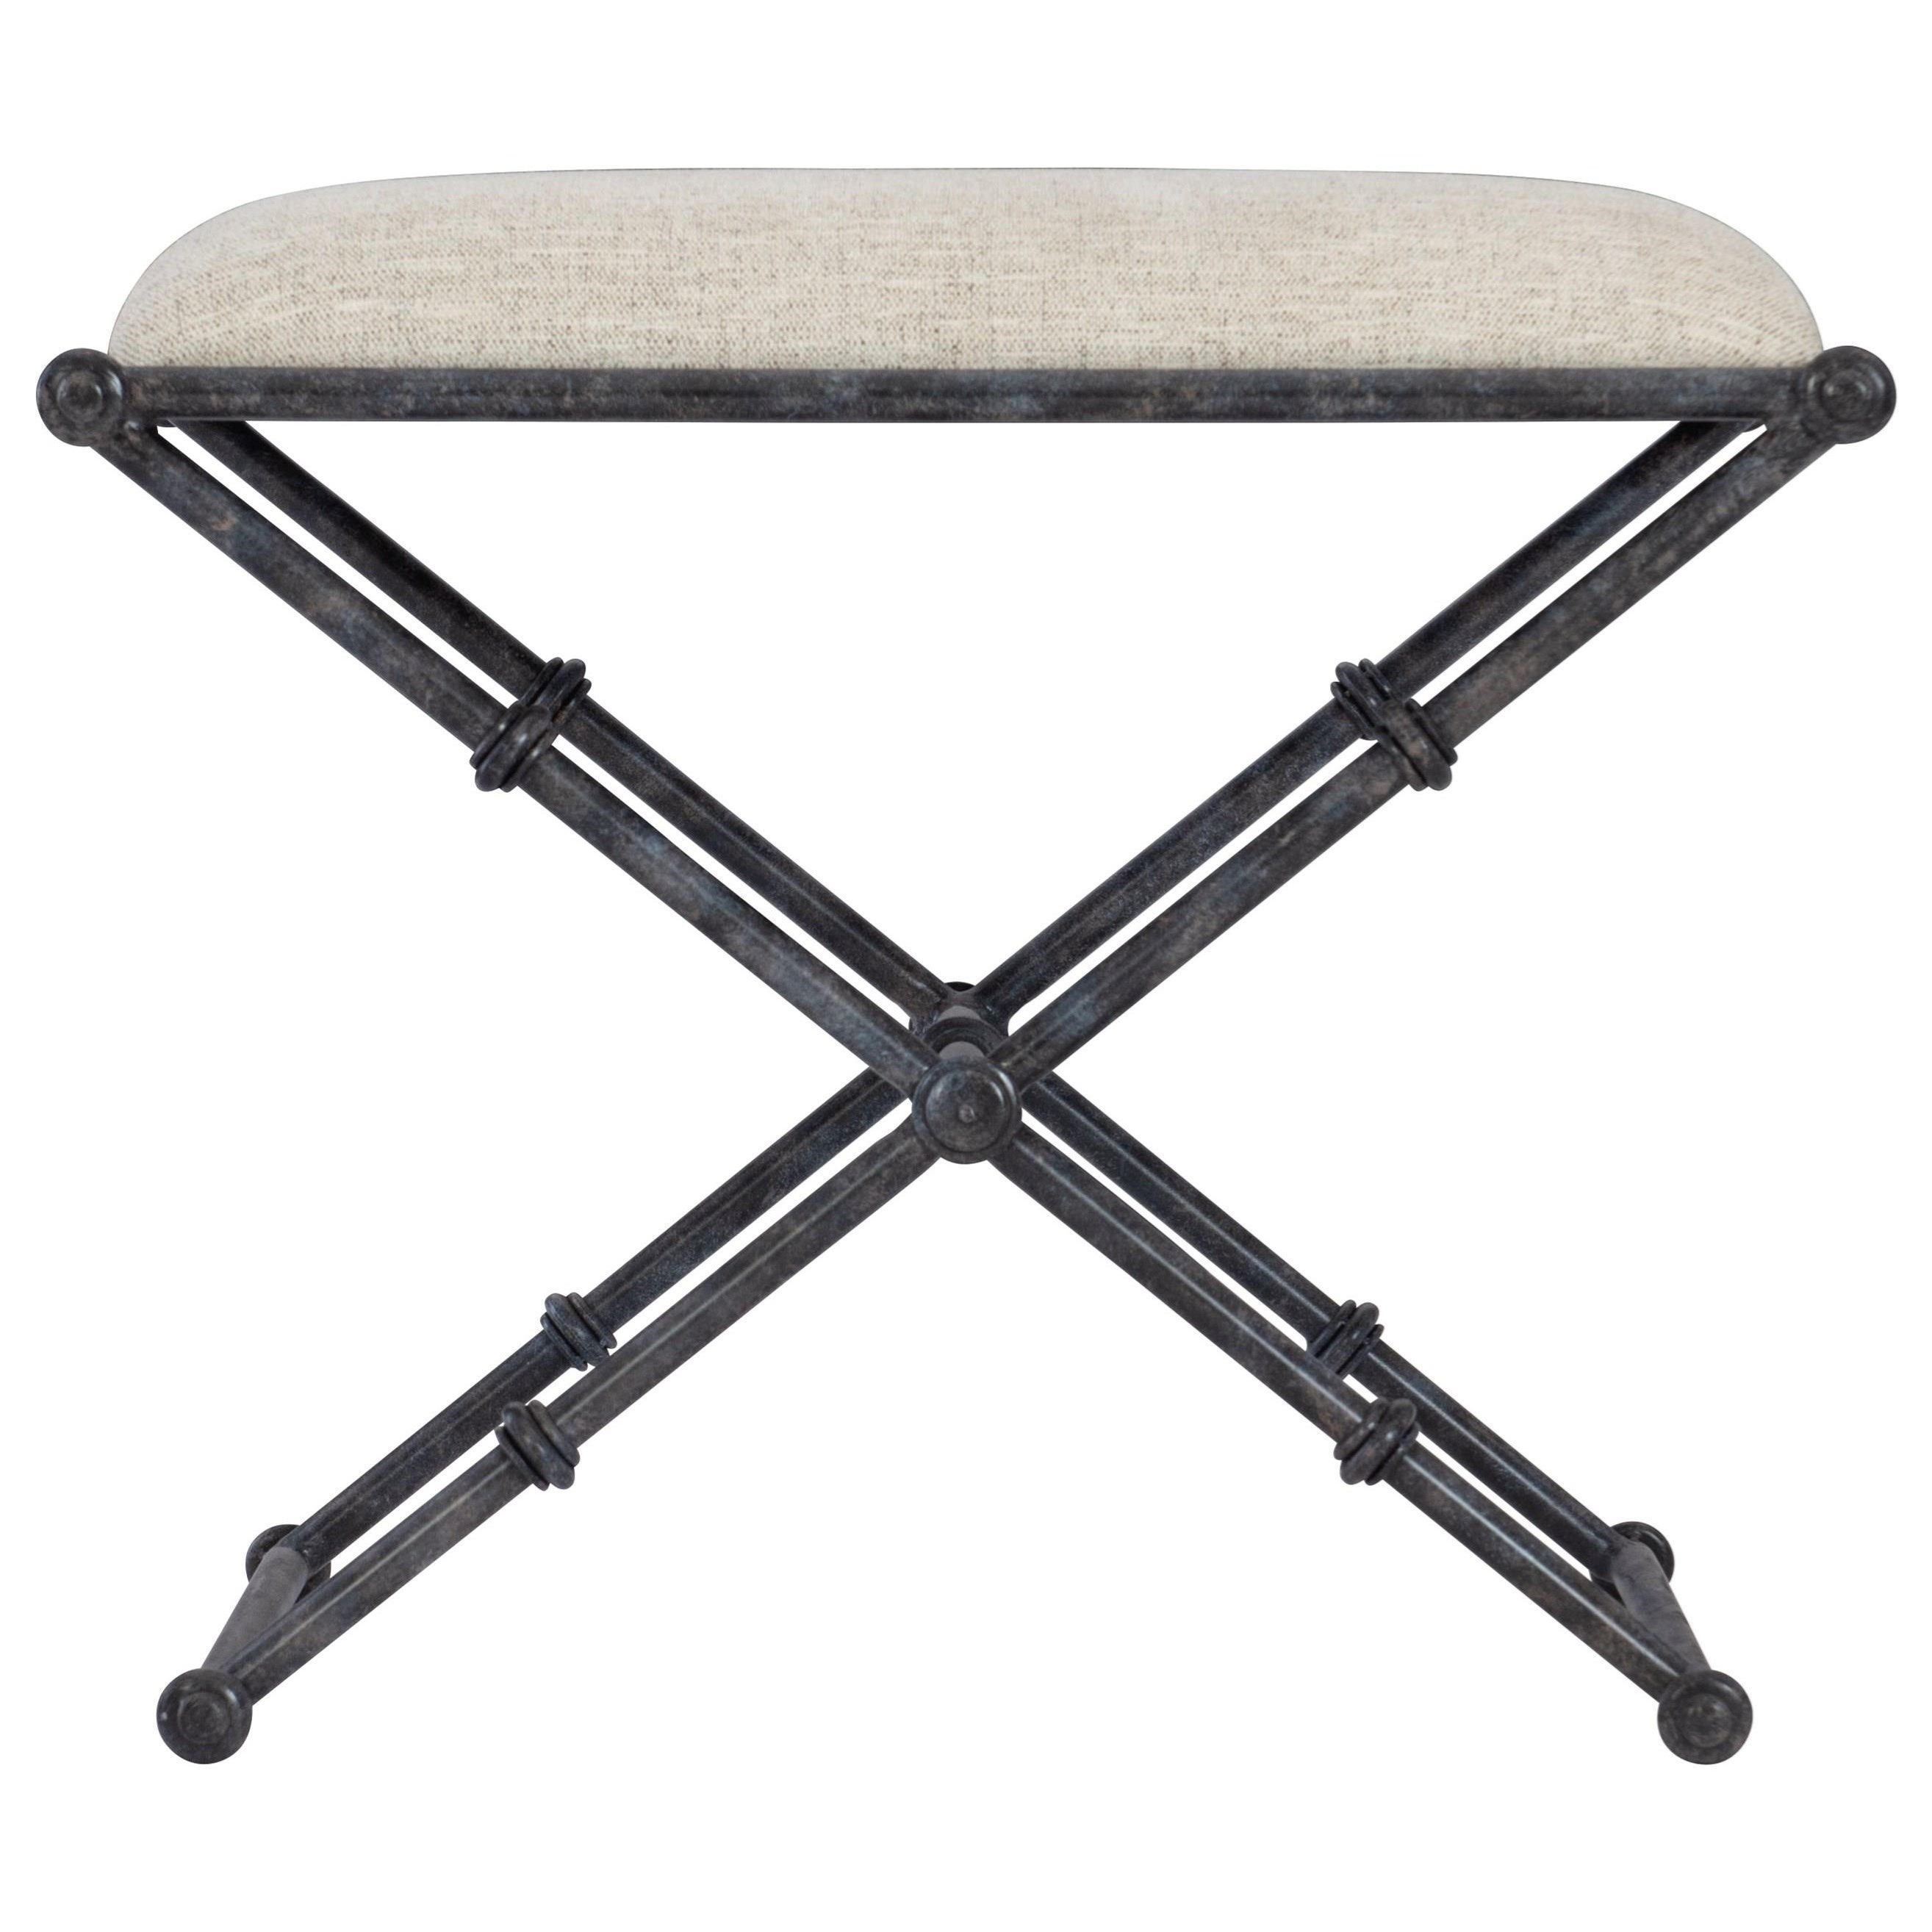 Mirabelle Metal Bench by Bernhardt at Baer's Furniture